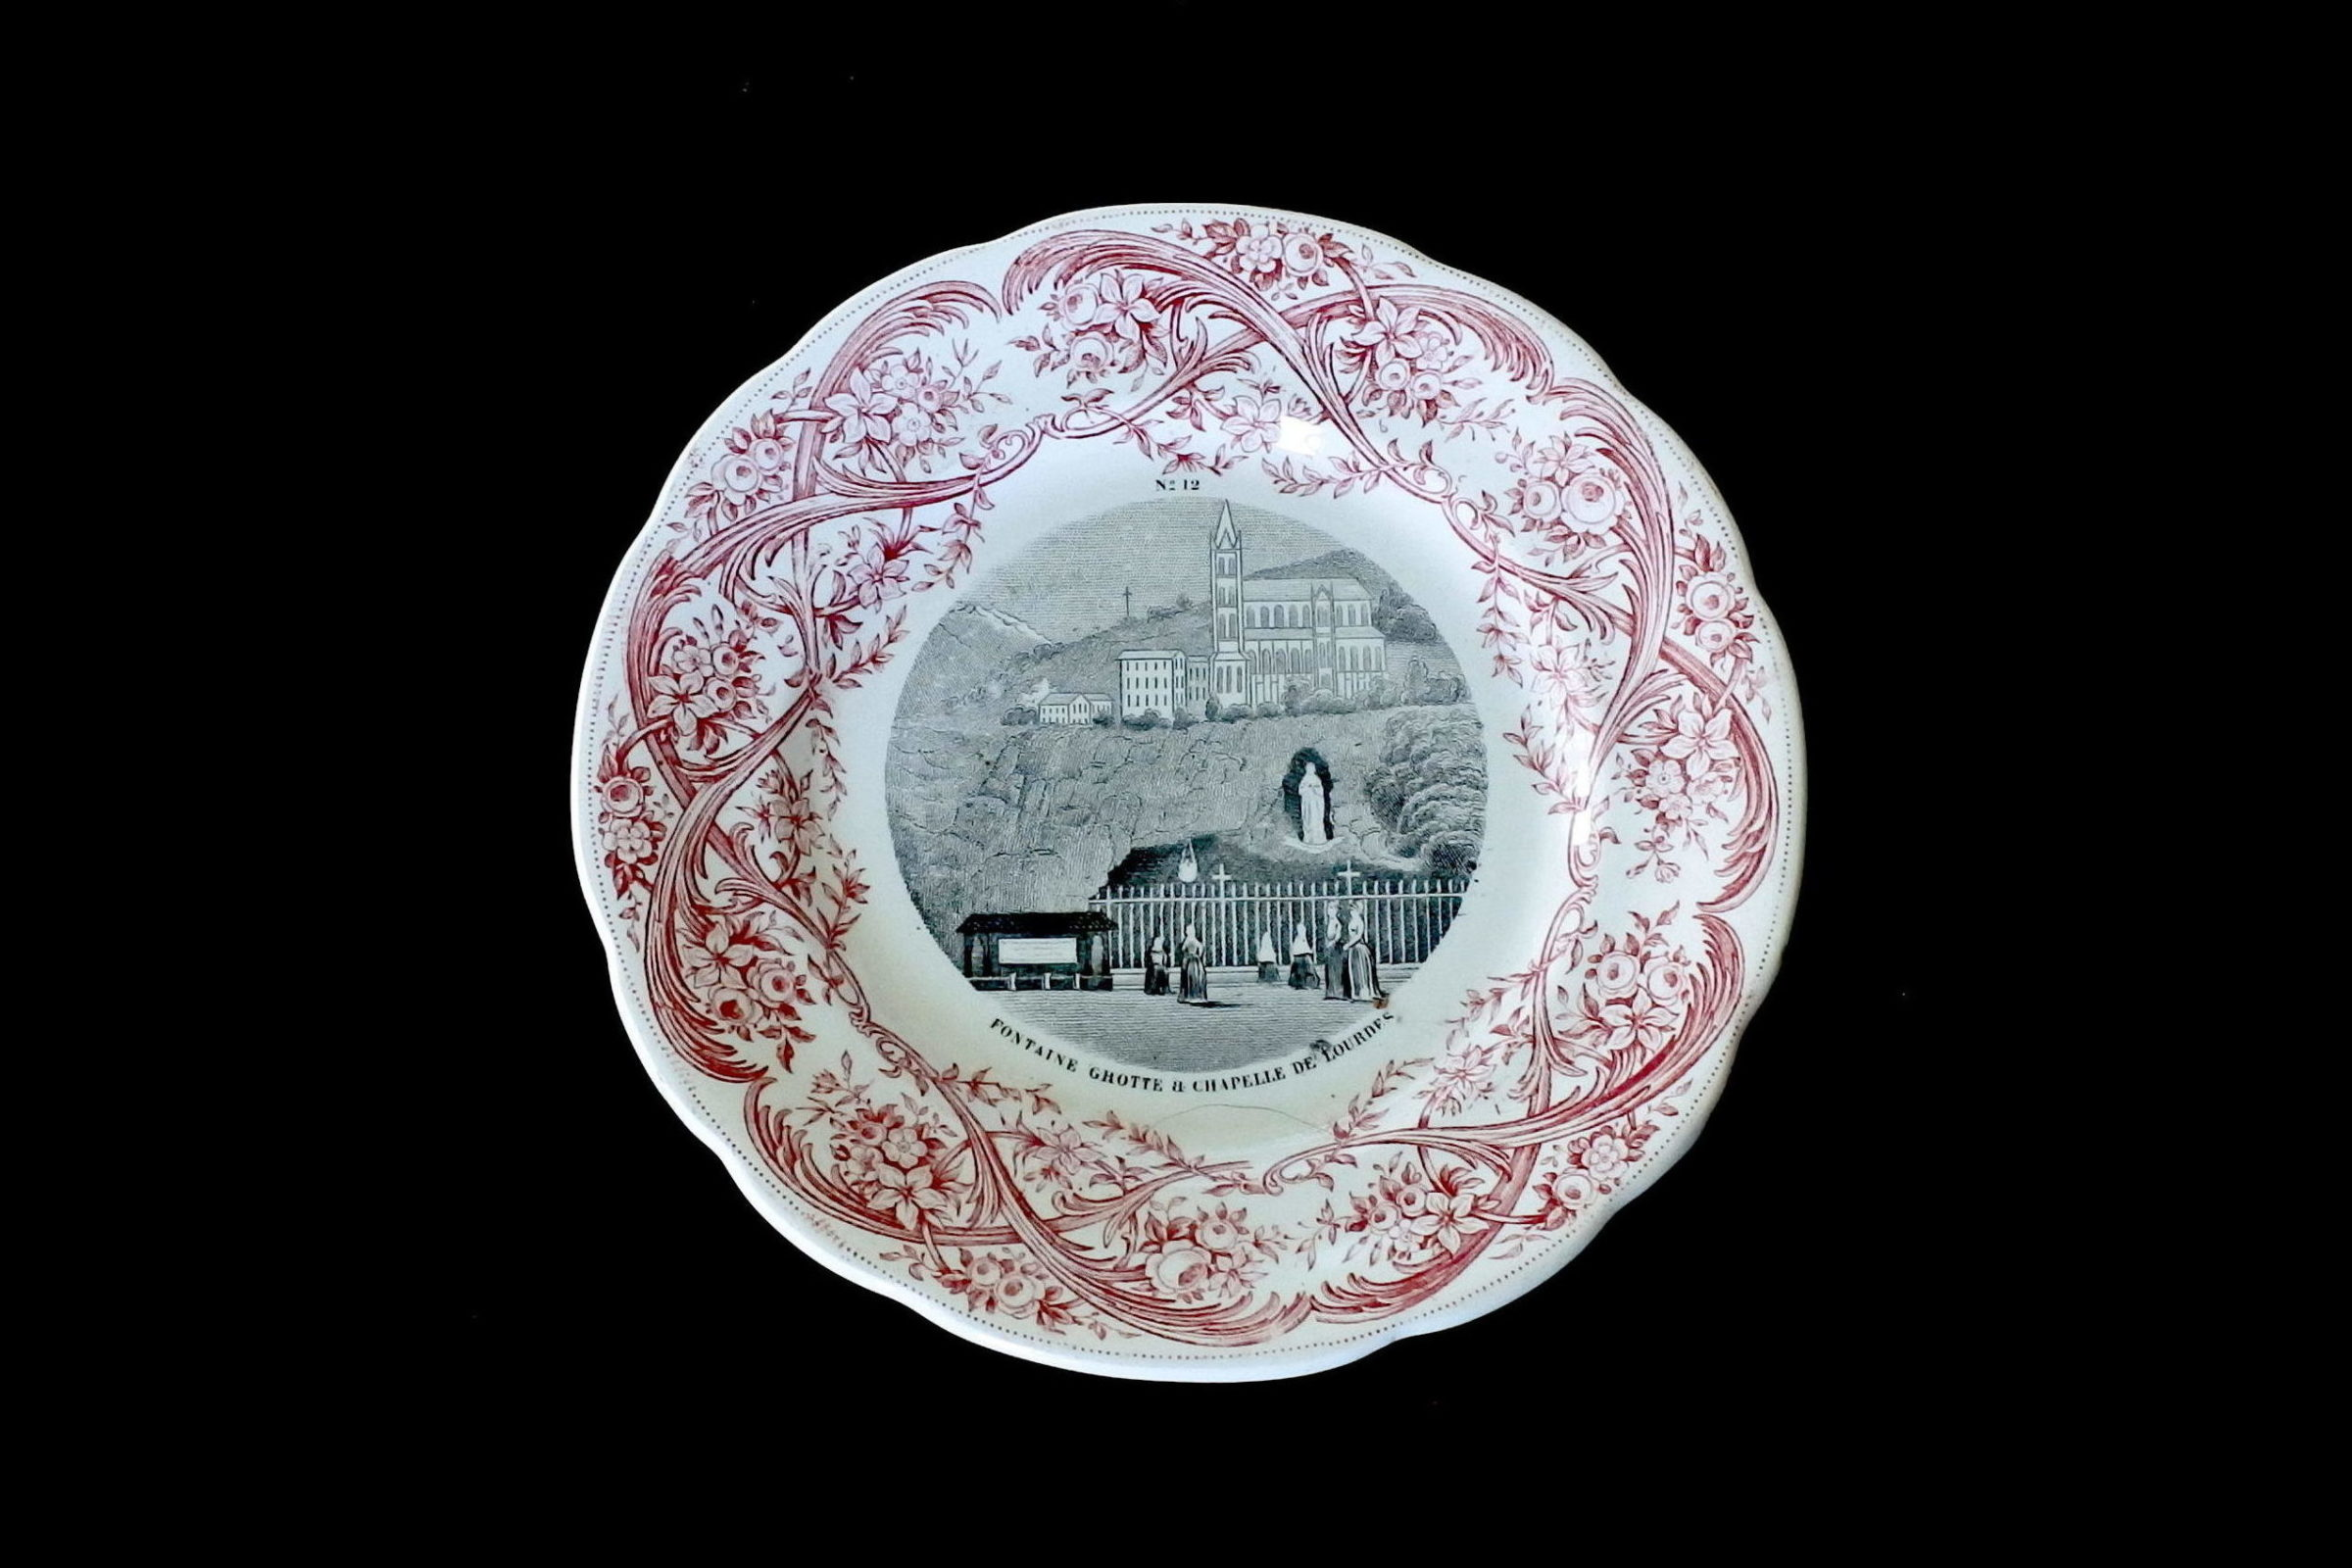 Serie completa di 12 piatti in ceramica dedicati alla vita di Bernadette - 13